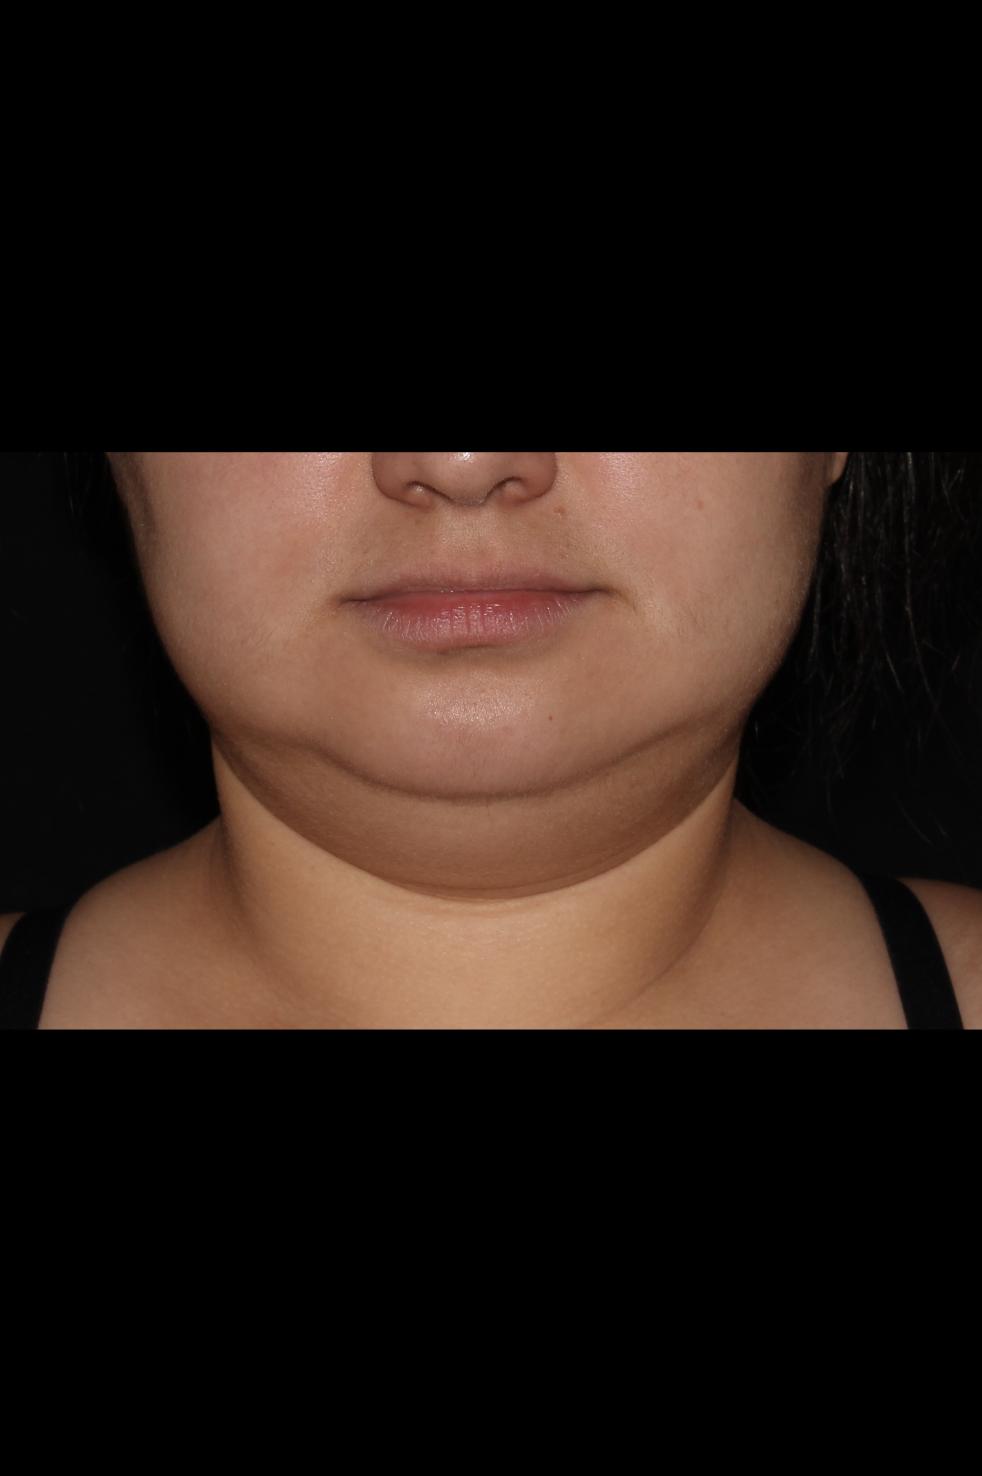 Before Neck Liposuction - Chin liposuction & Magic Tight®